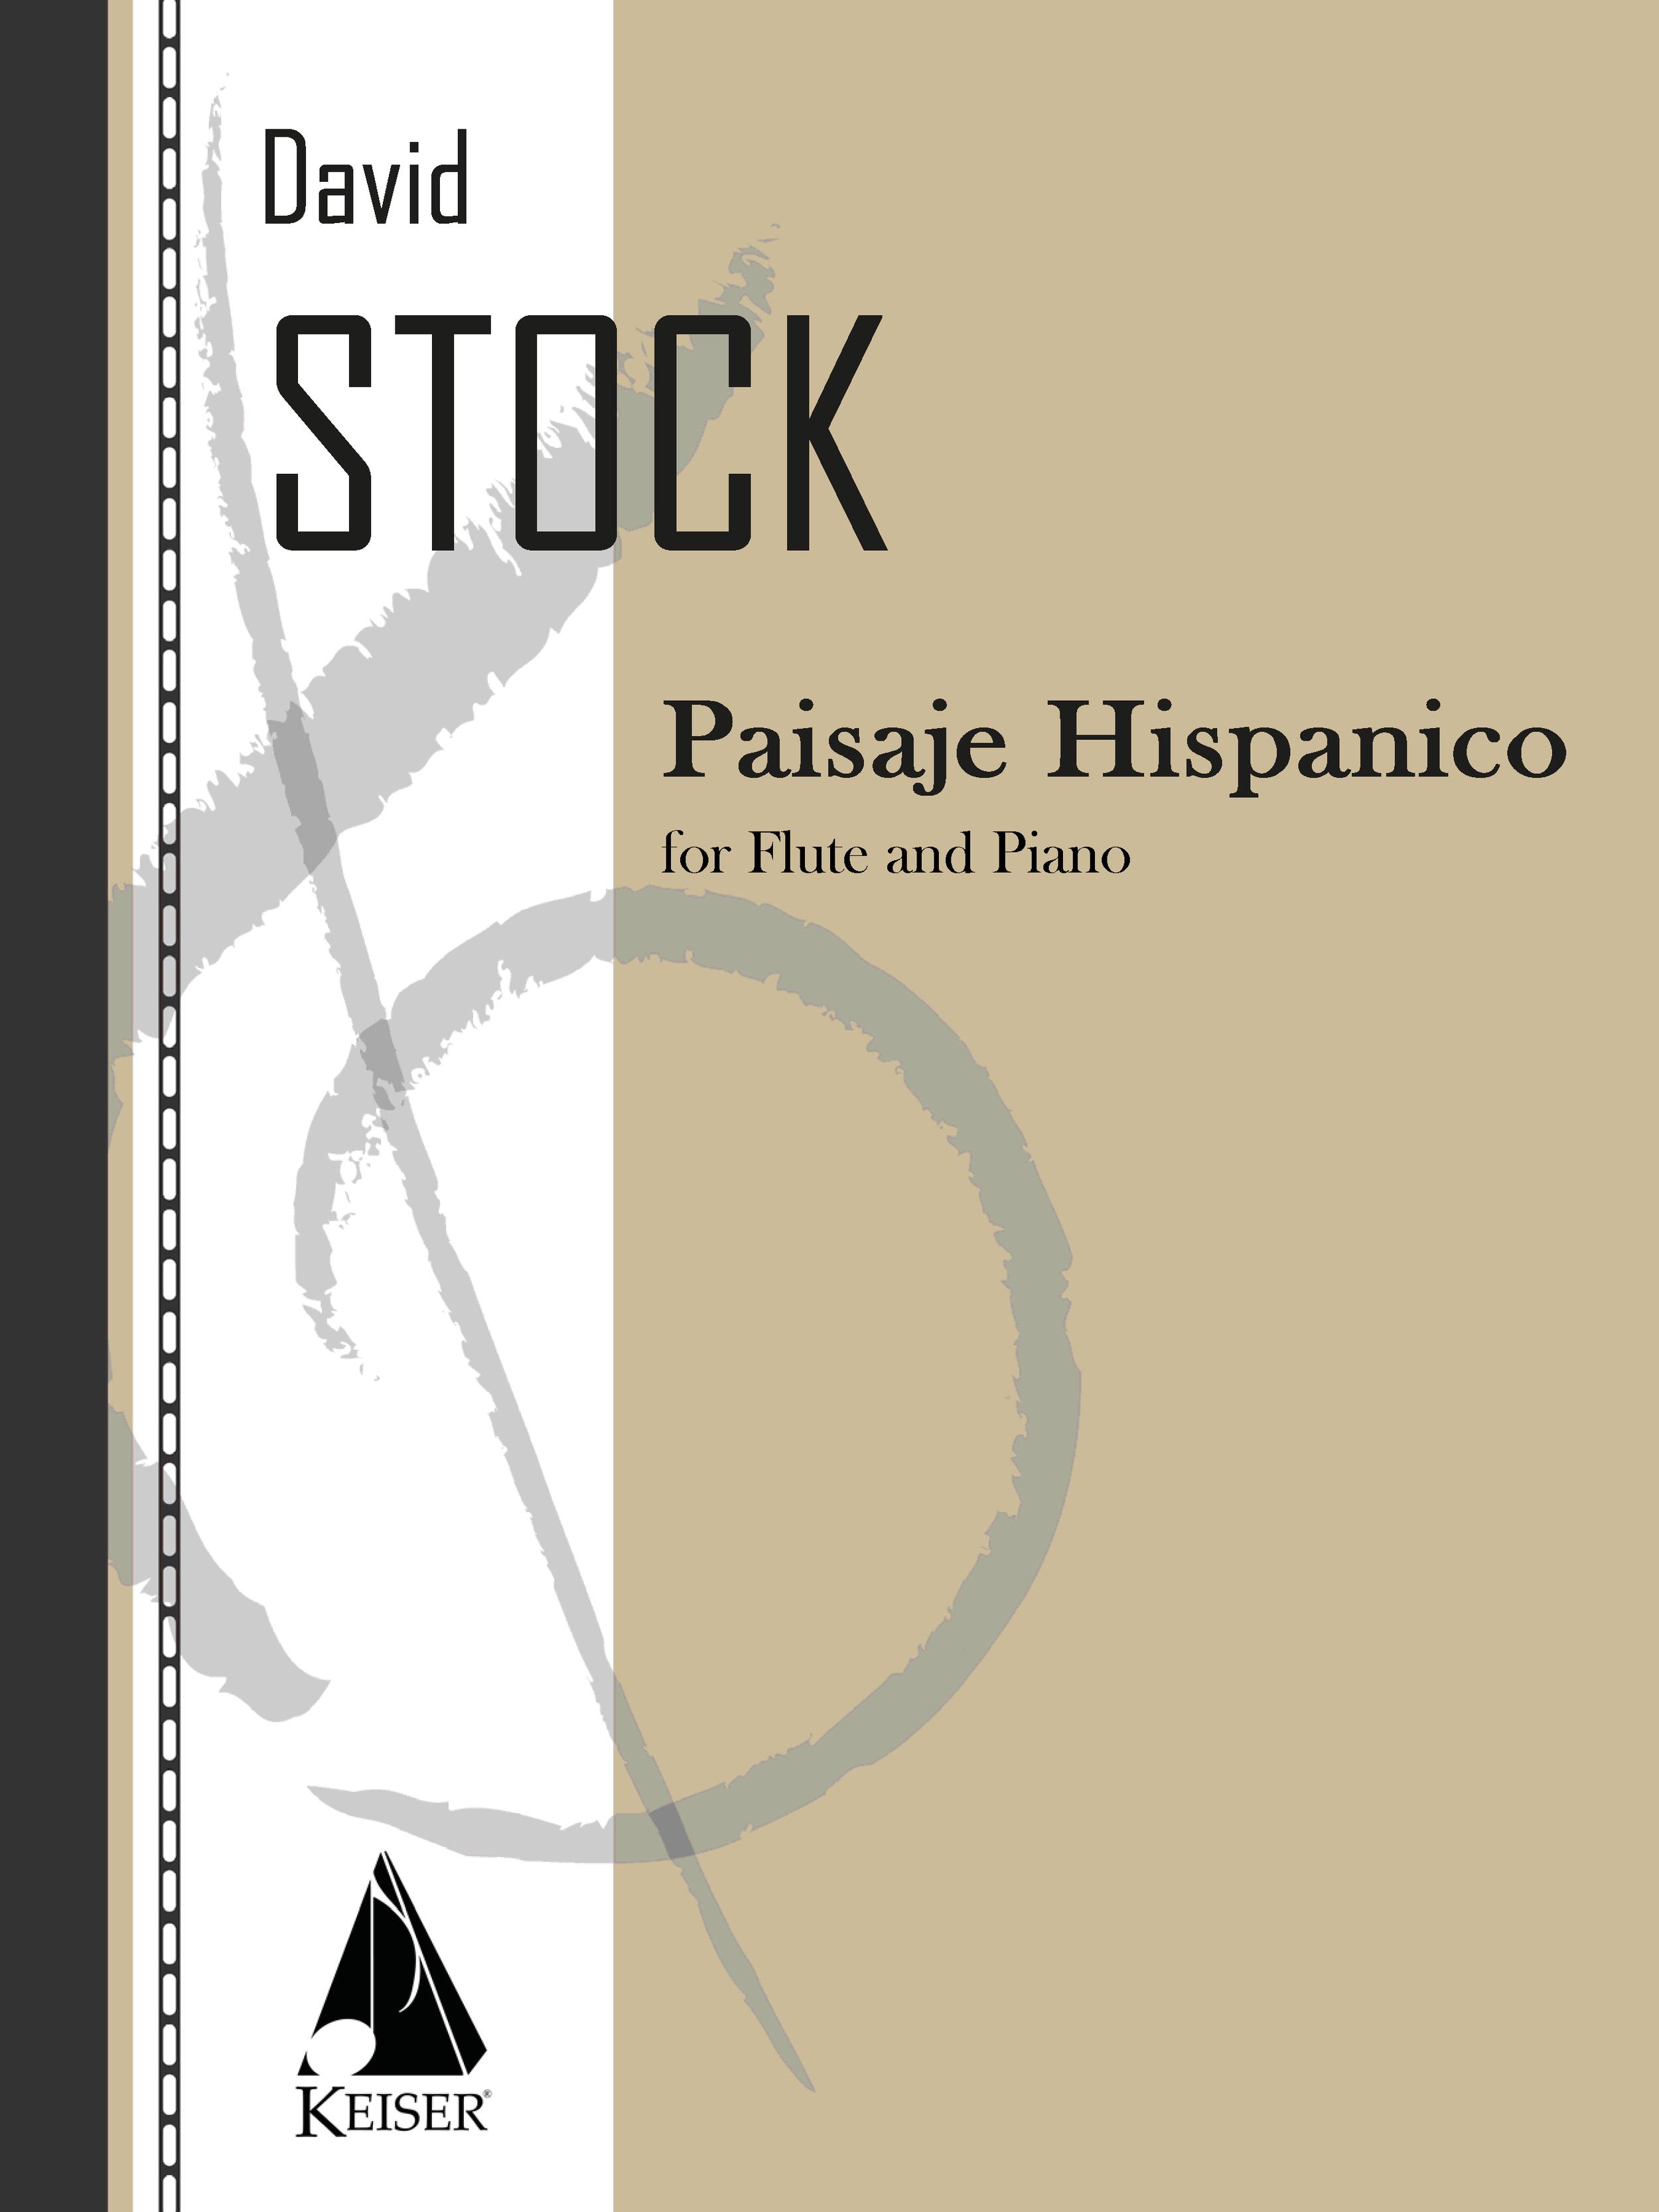 Paisaje Hispanico (2002) - Flute, PianoRent/Buy:Keiser Music